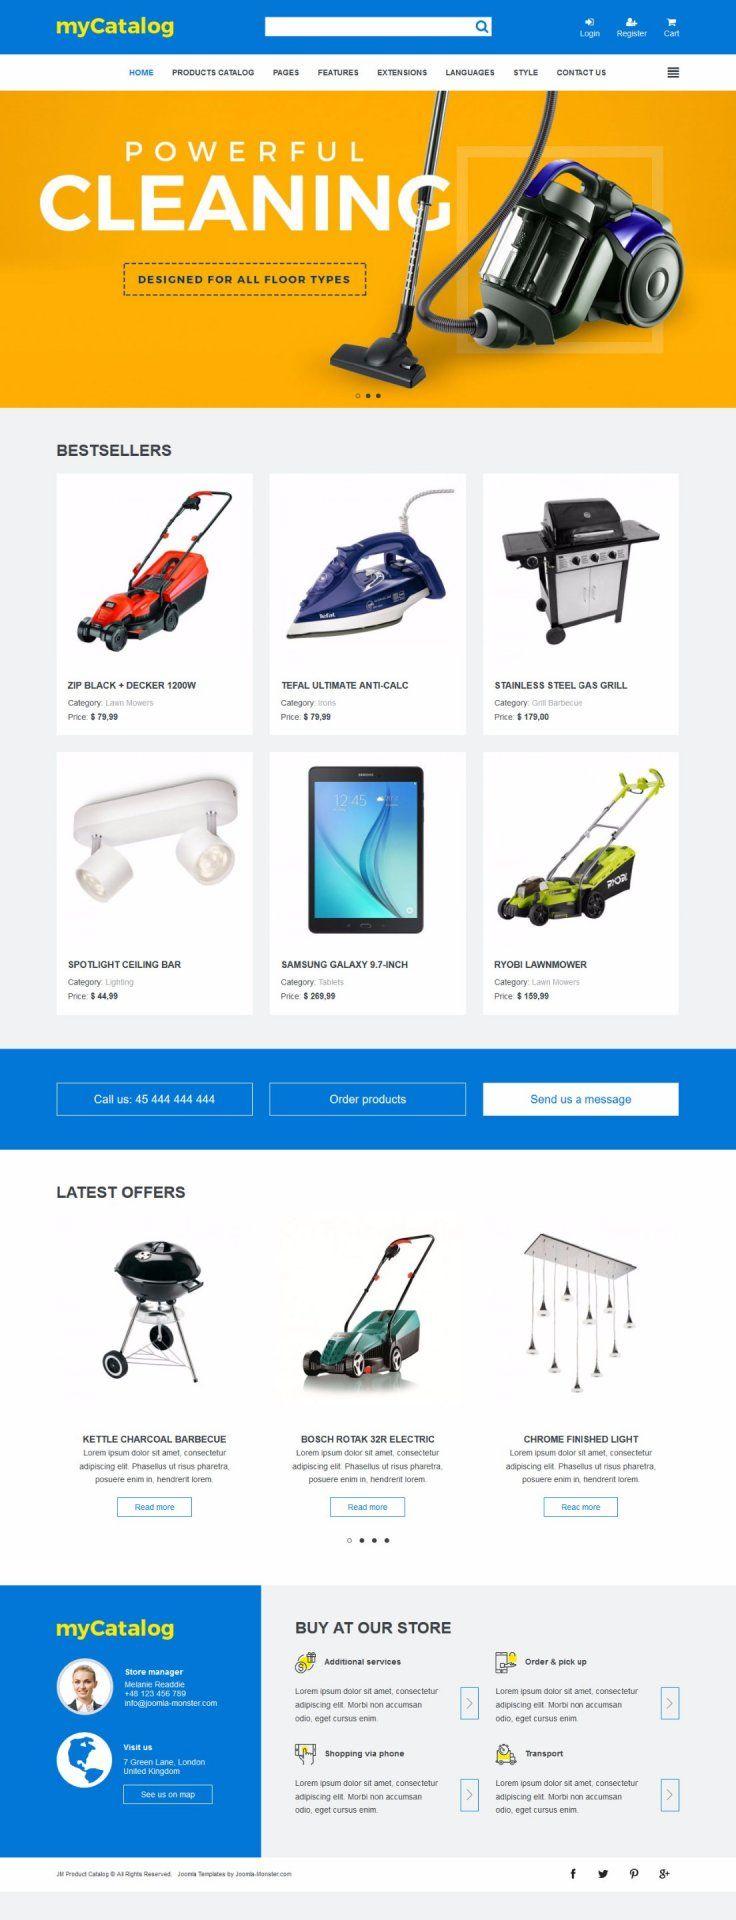 JM Product Catalog Joomla Template https